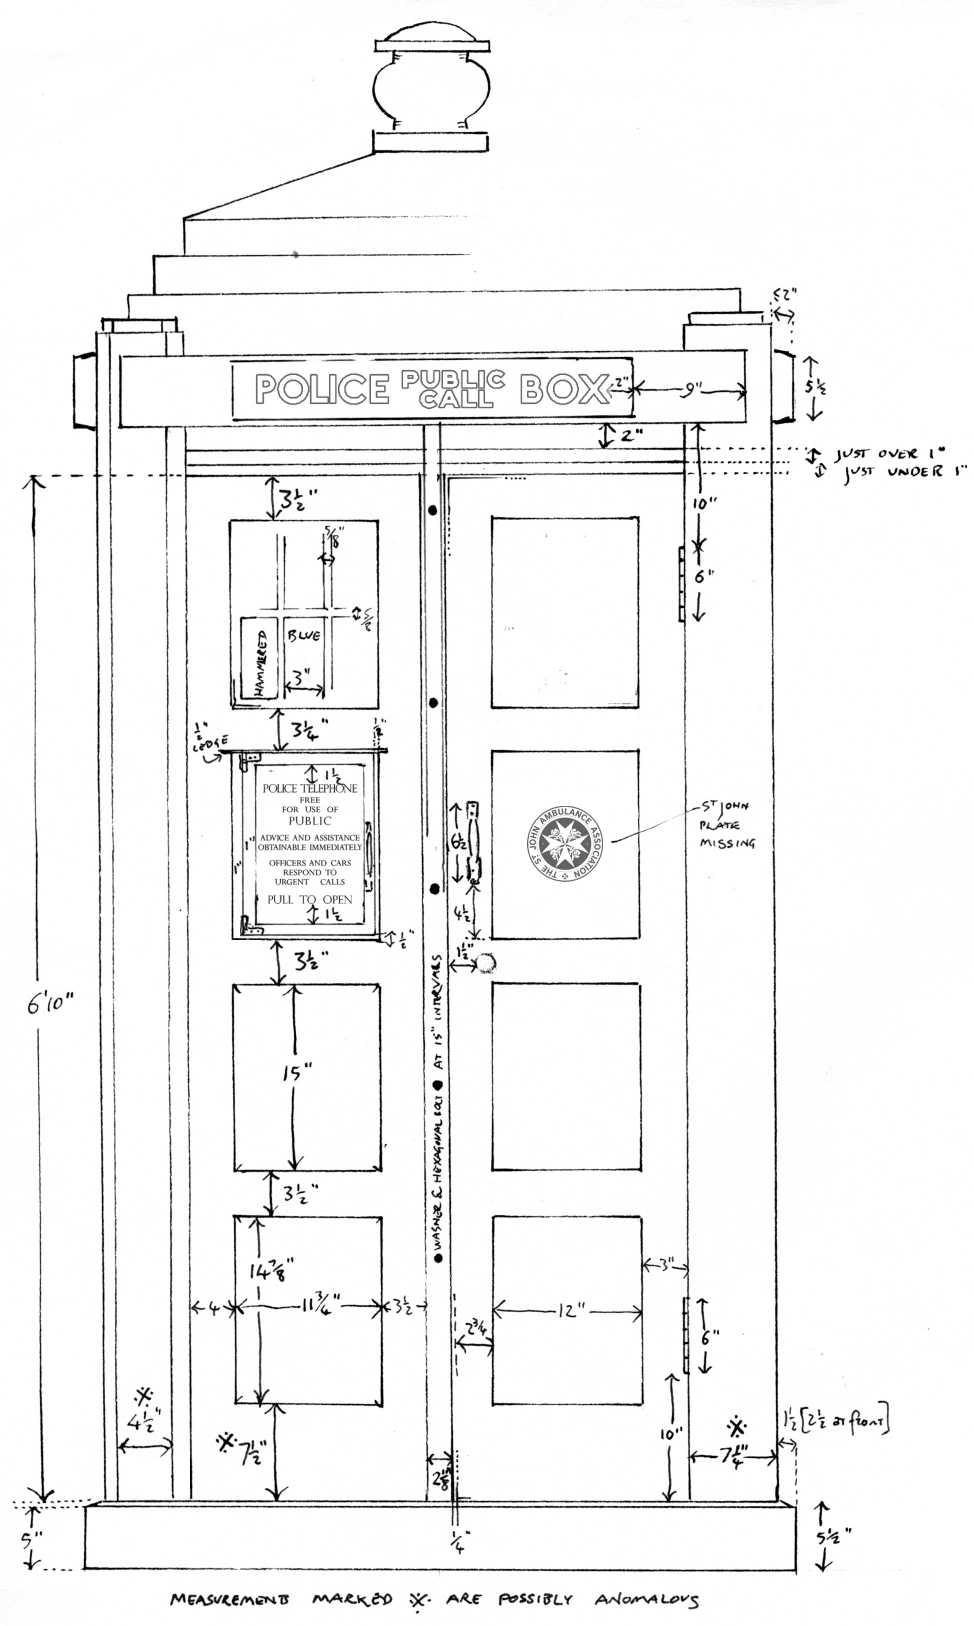 Barnet_Box_Measurements-Ironageman.jpg